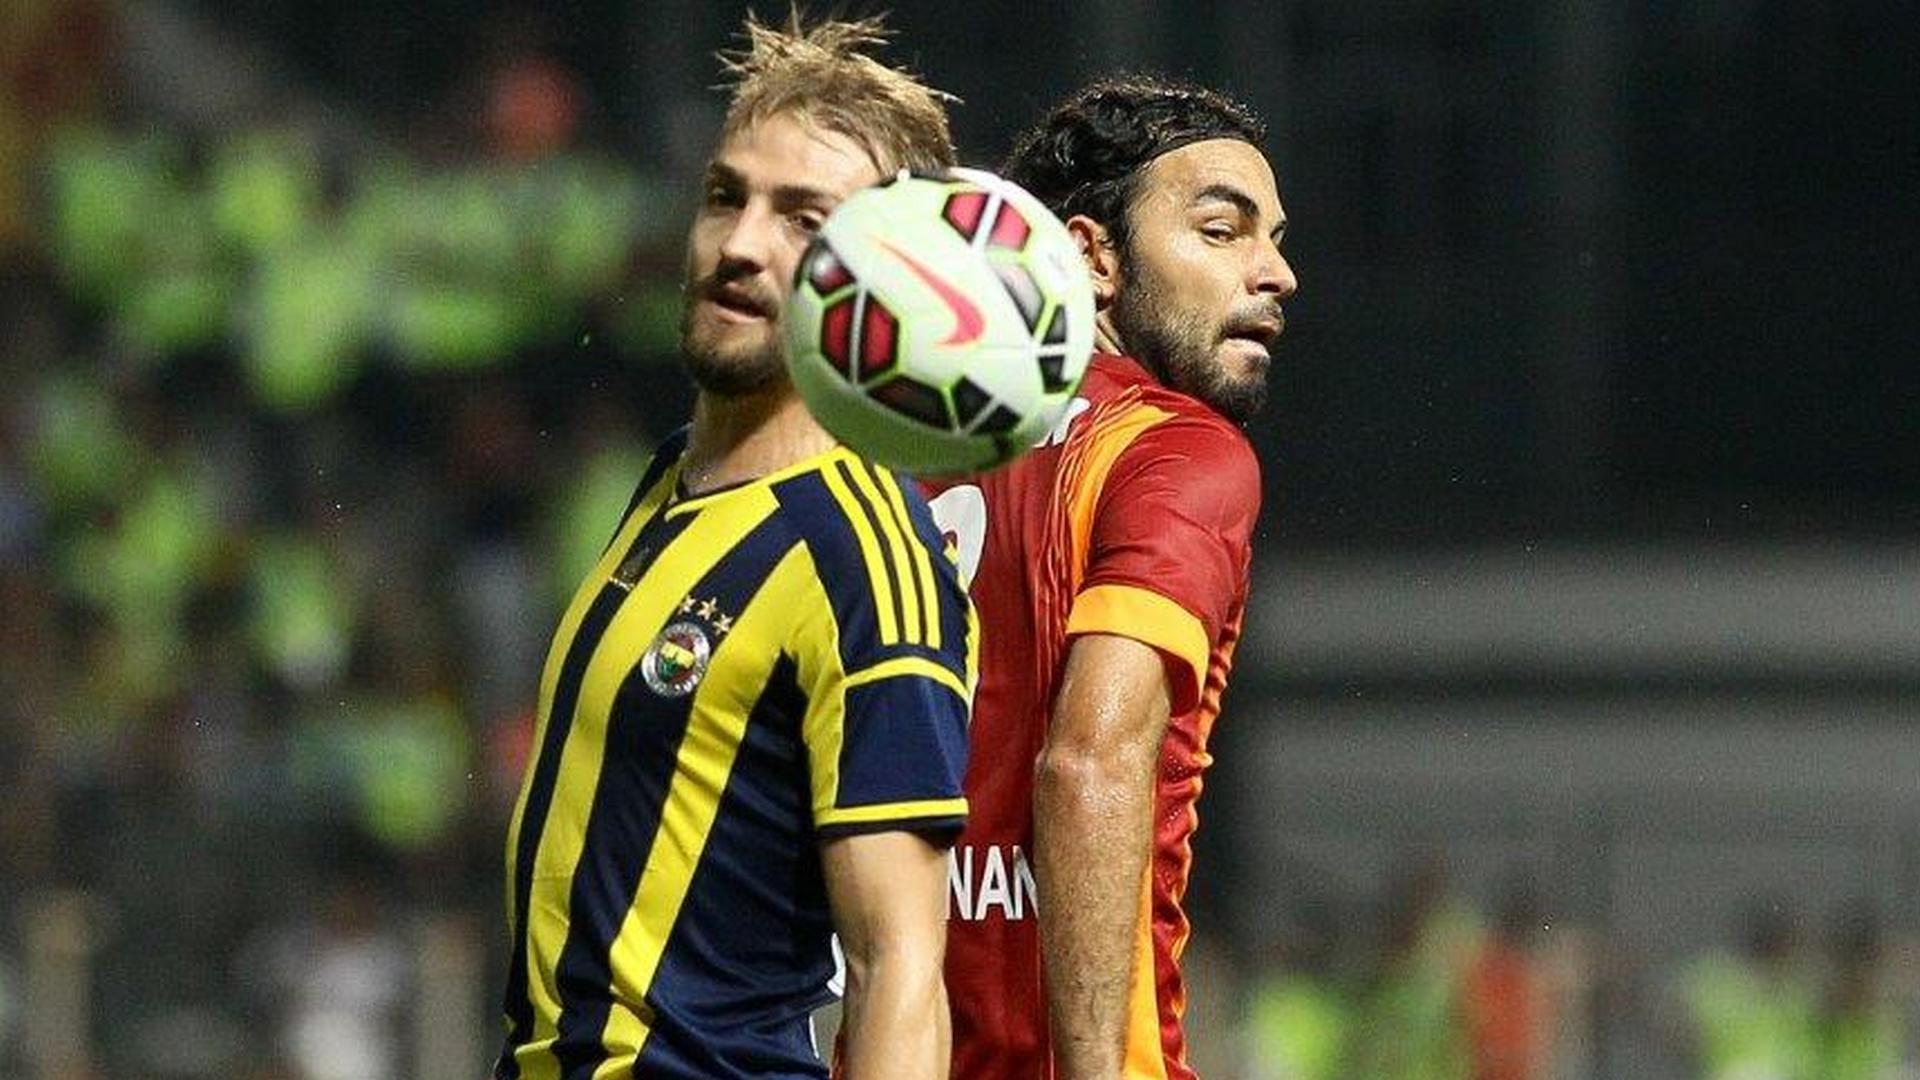 Önce Fenerbahçe sonra Galatasaray'da oynayan oyuncular